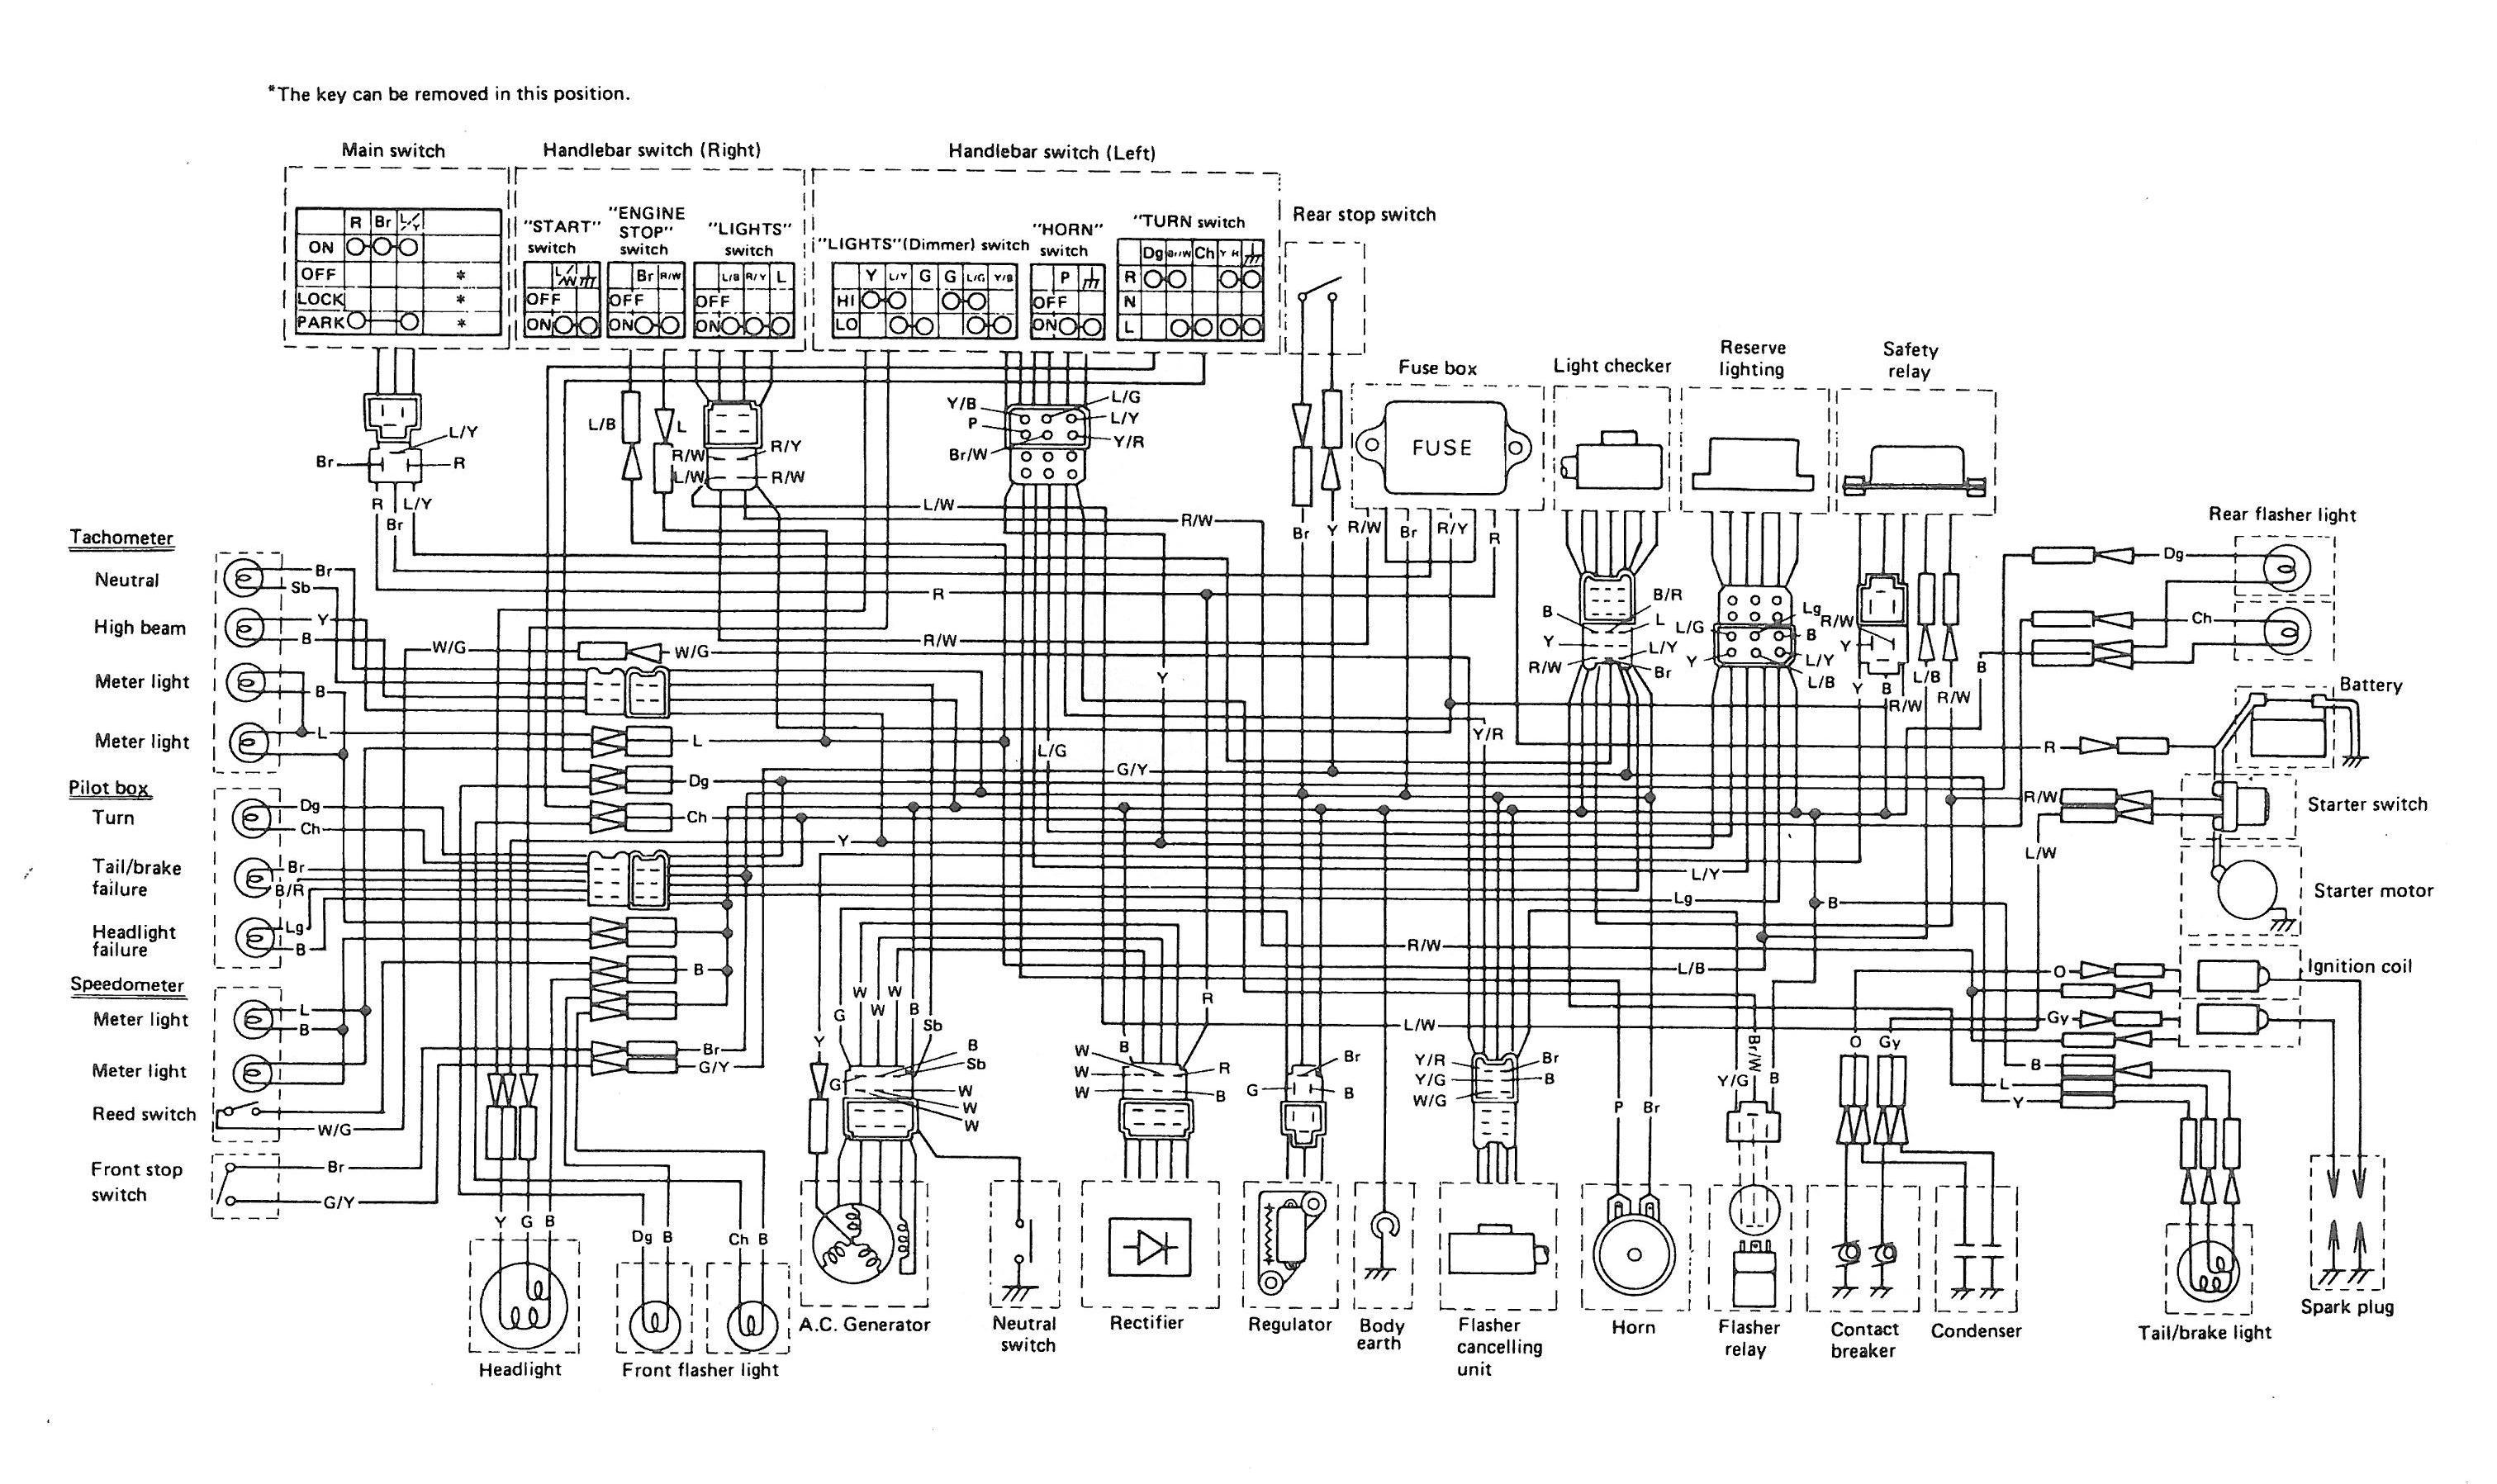 Yamaha Enduro Wiring Diagram Electrical Schematics Motorcycle Diagrams For Free 250 Harness Vehicle U2022 Atv